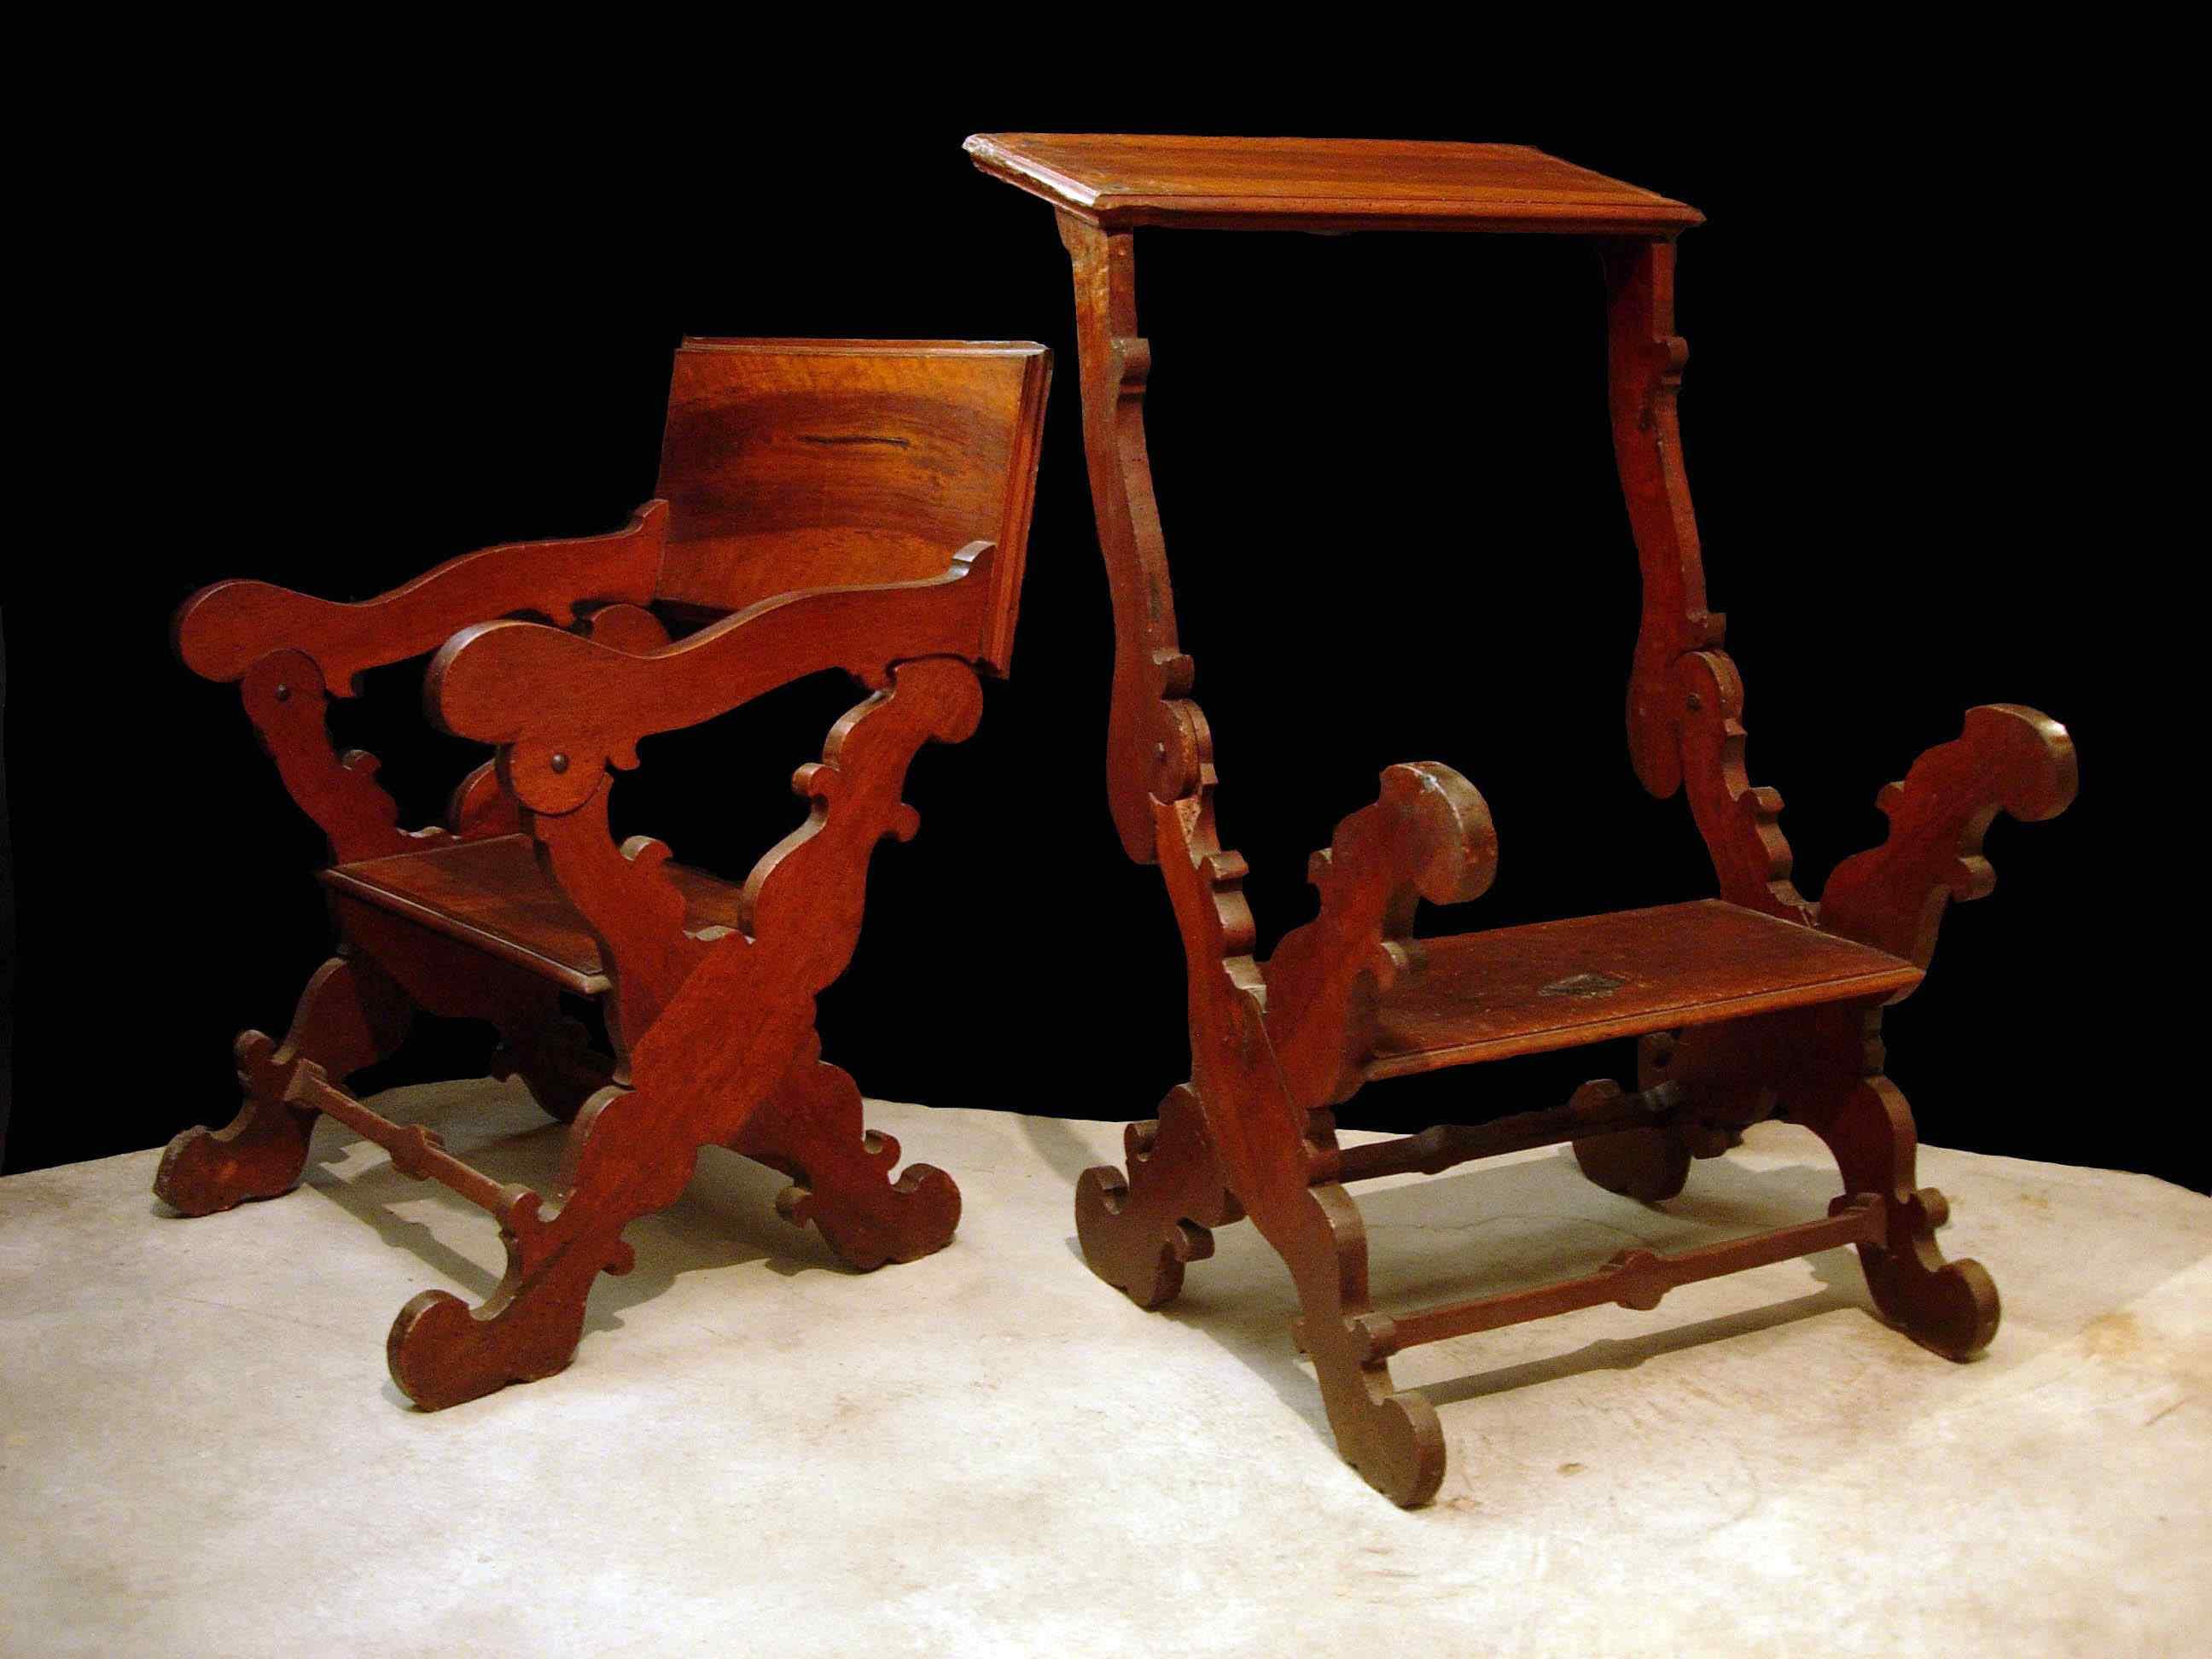 Pair of scissor armchairs, Tuscany, 17th century